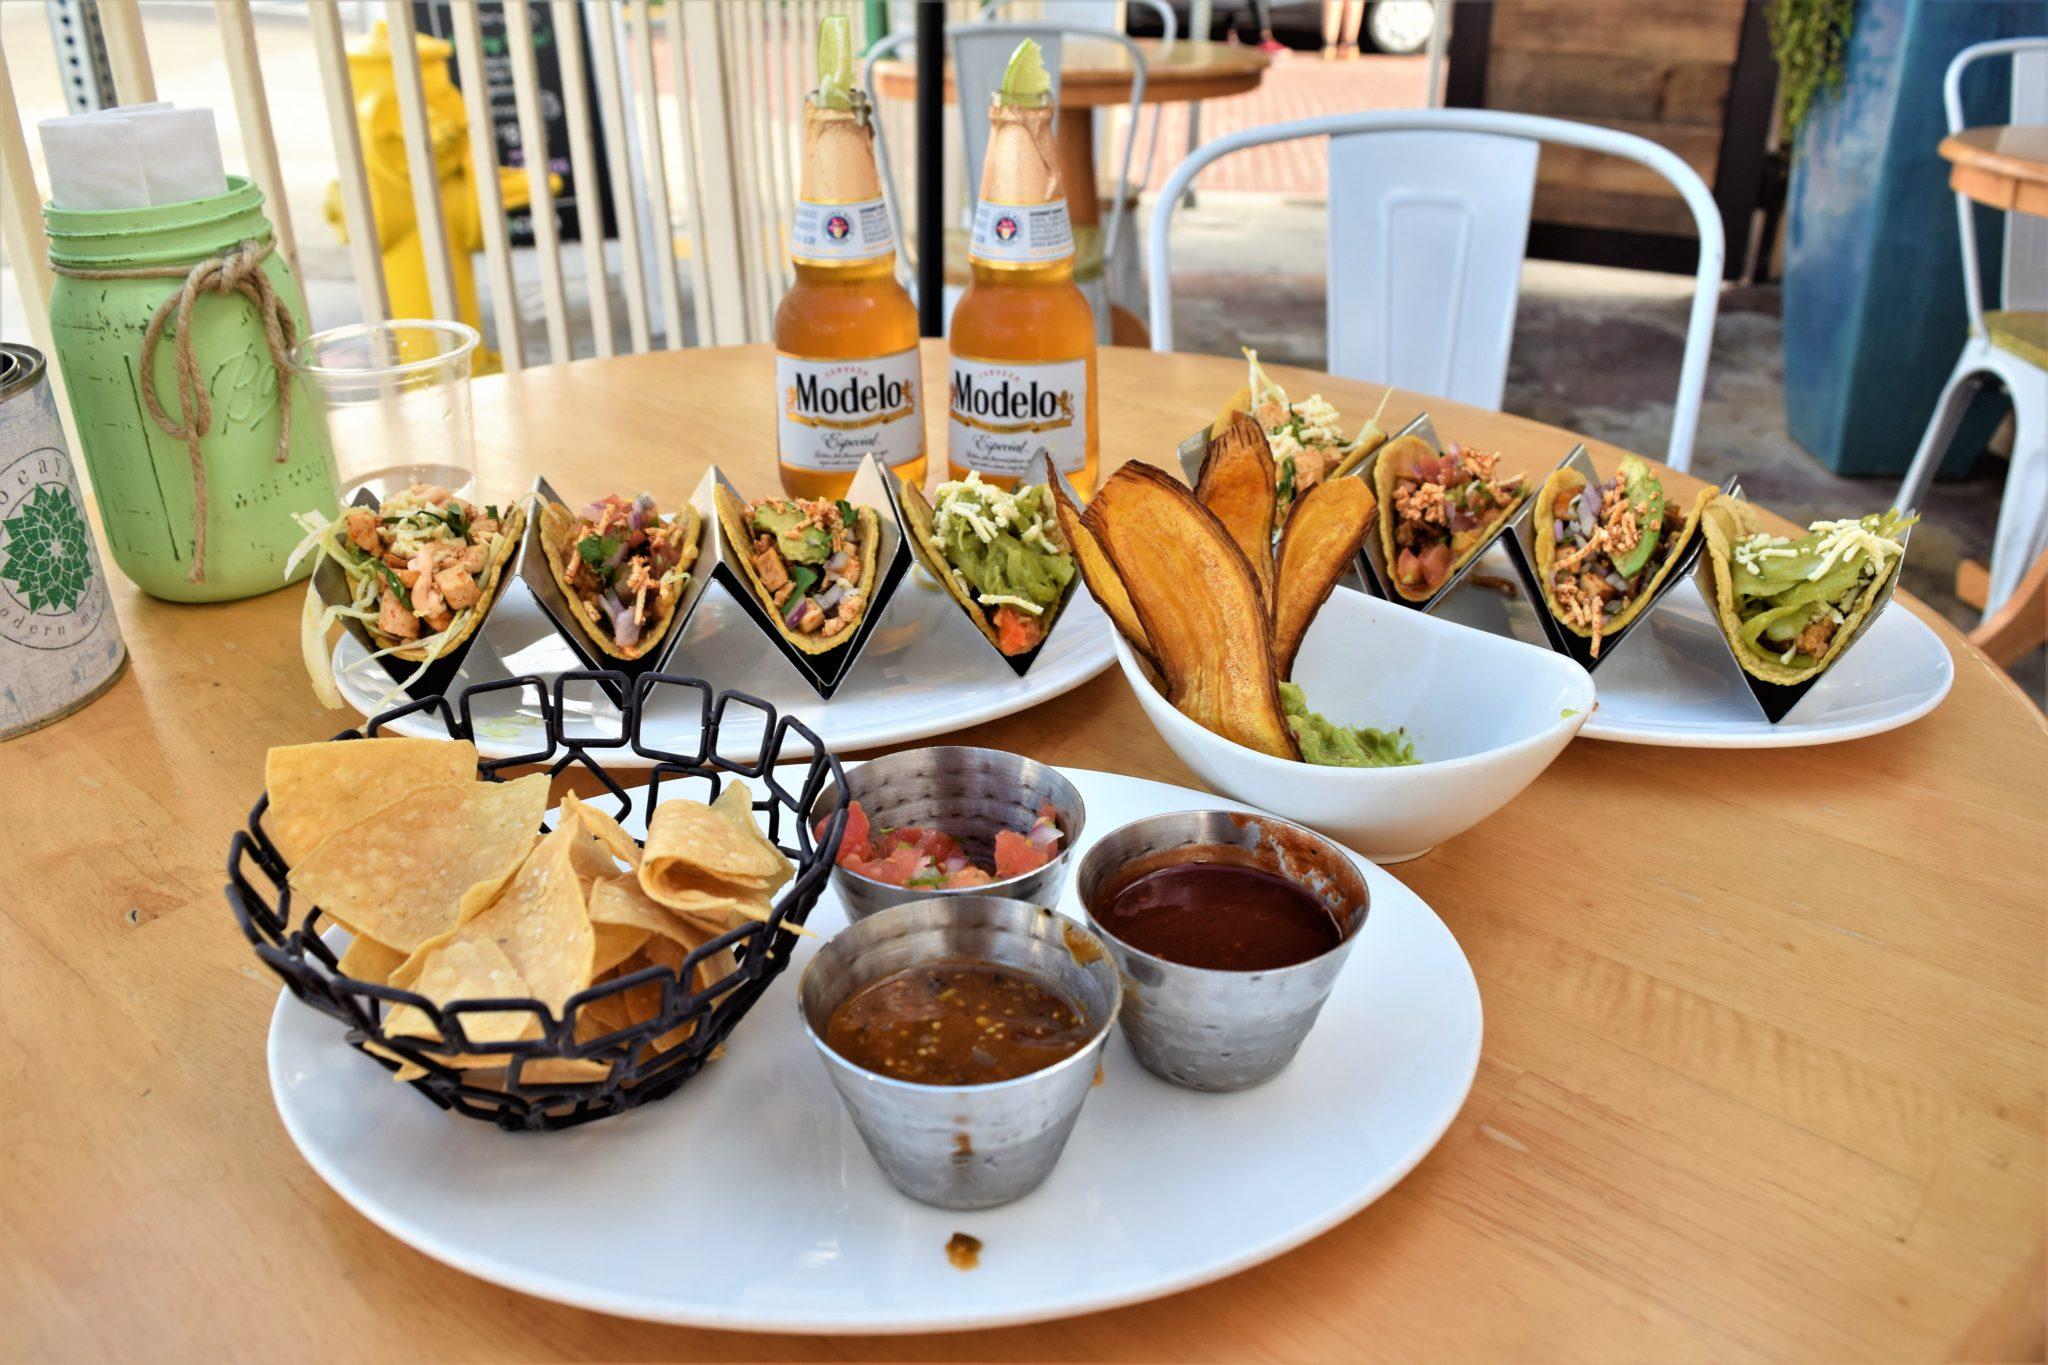 Vegan restaurants Los Angeles, Tocaya Organica, California, Venice Beach